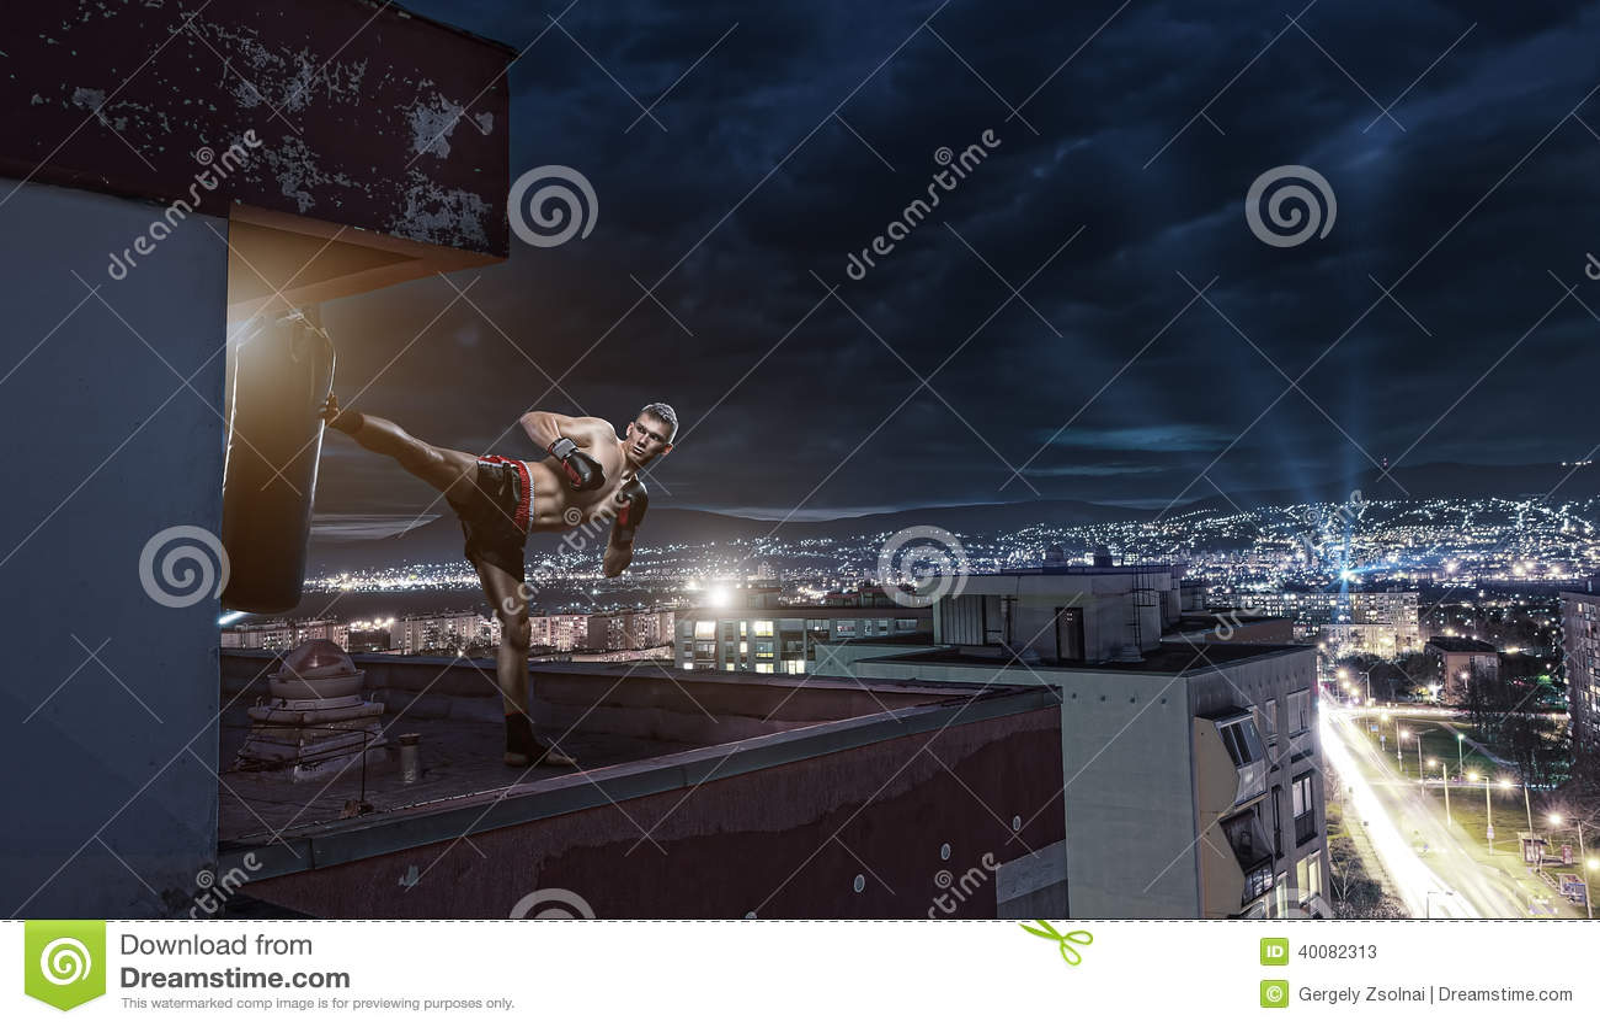 Тренировка бокса молодого человека, na górze дома над городом